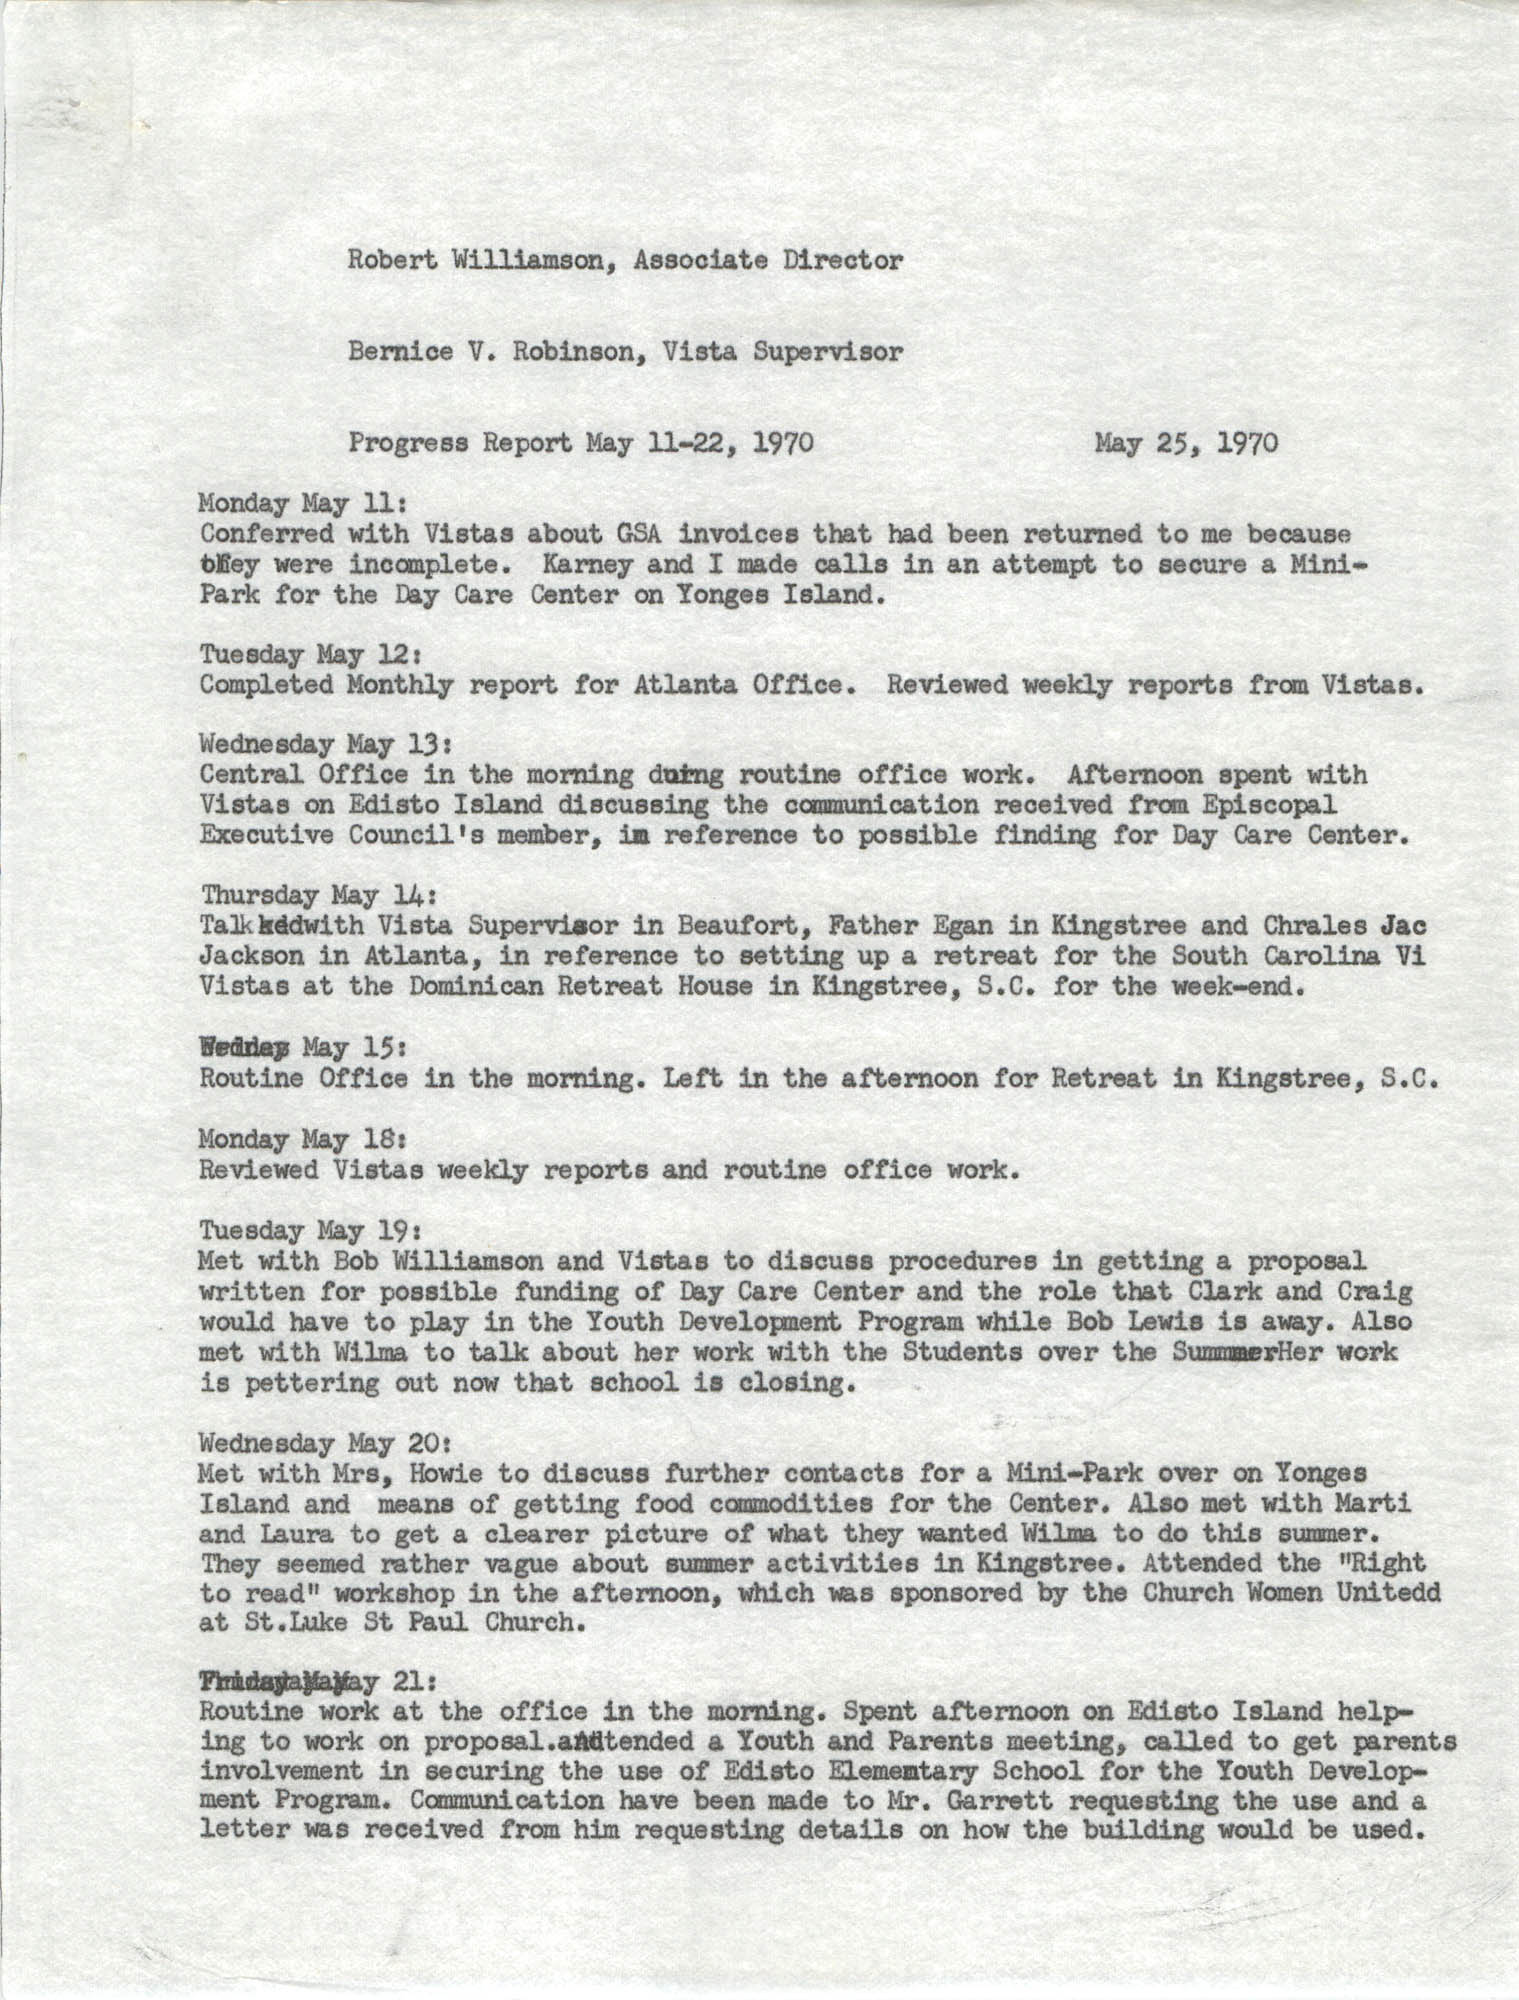 VISTA Activity Report, May 11-22, 1970